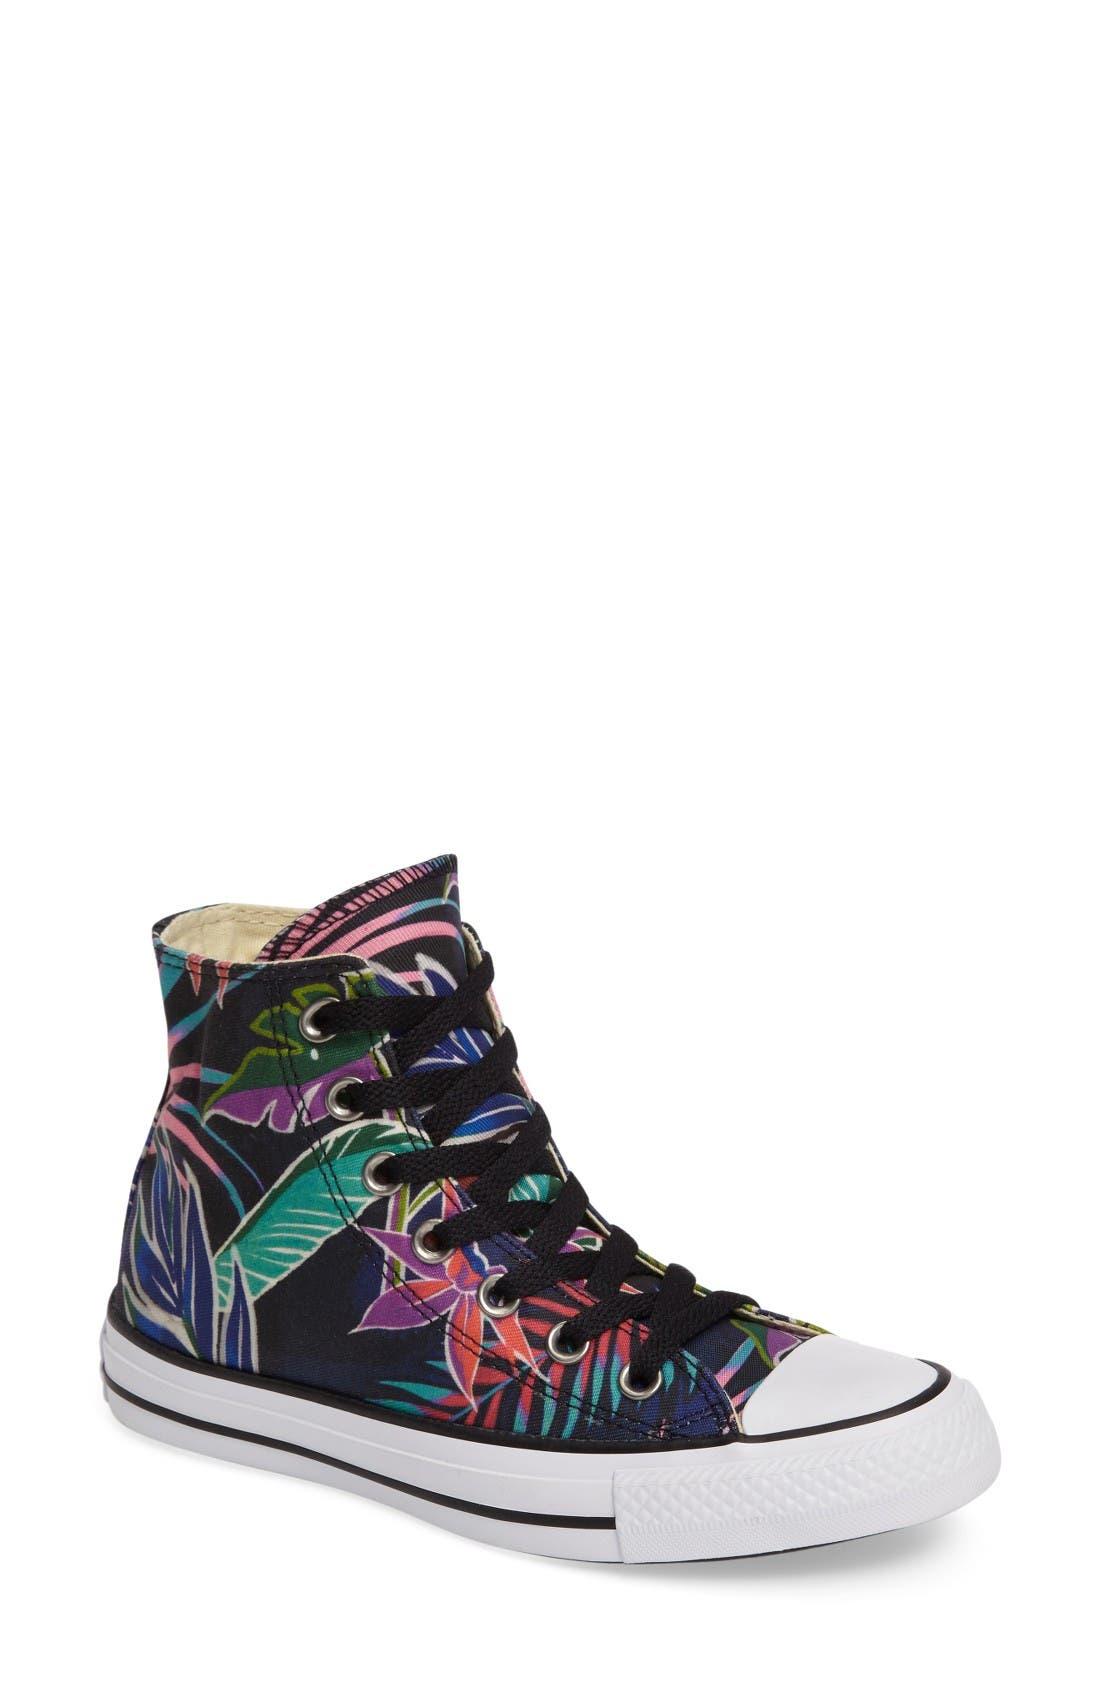 Alternate Image 1 Selected - Converse Chuck Taylor® All Star® Print High Top Sneaker (Women)